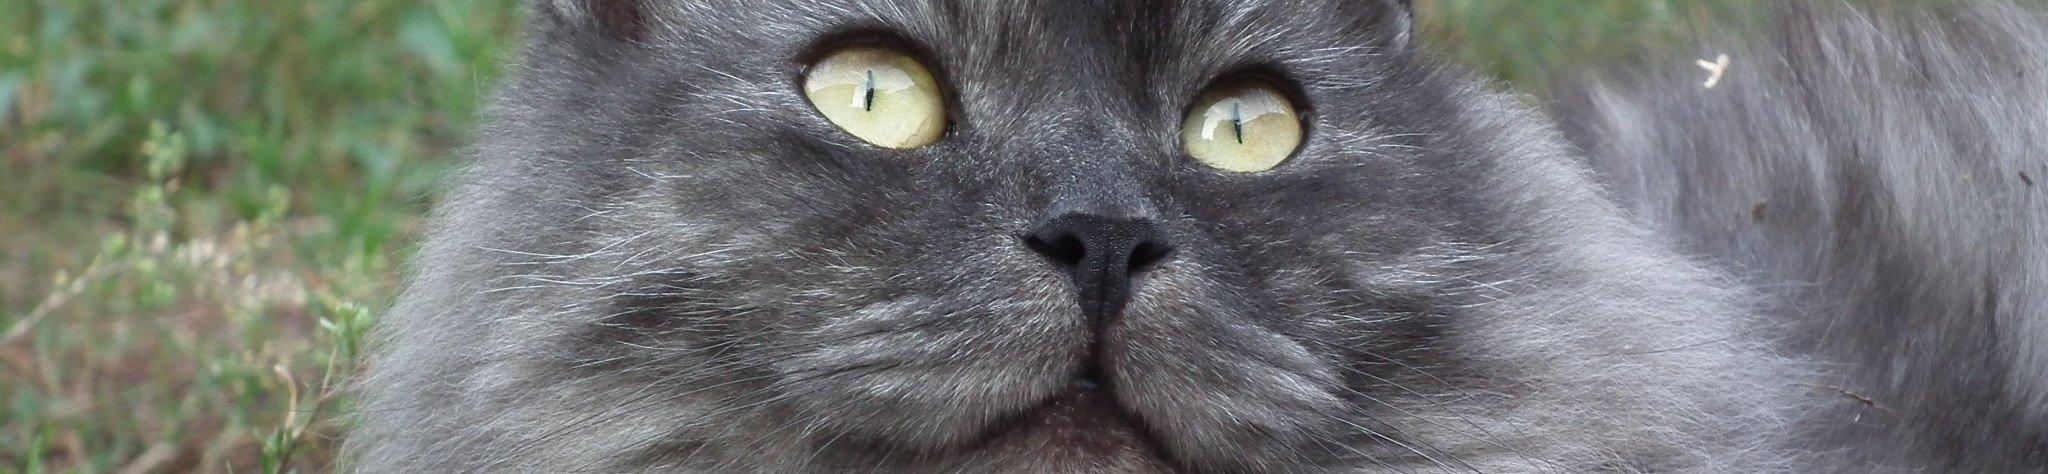 Siberische kat - Siberischekat banner